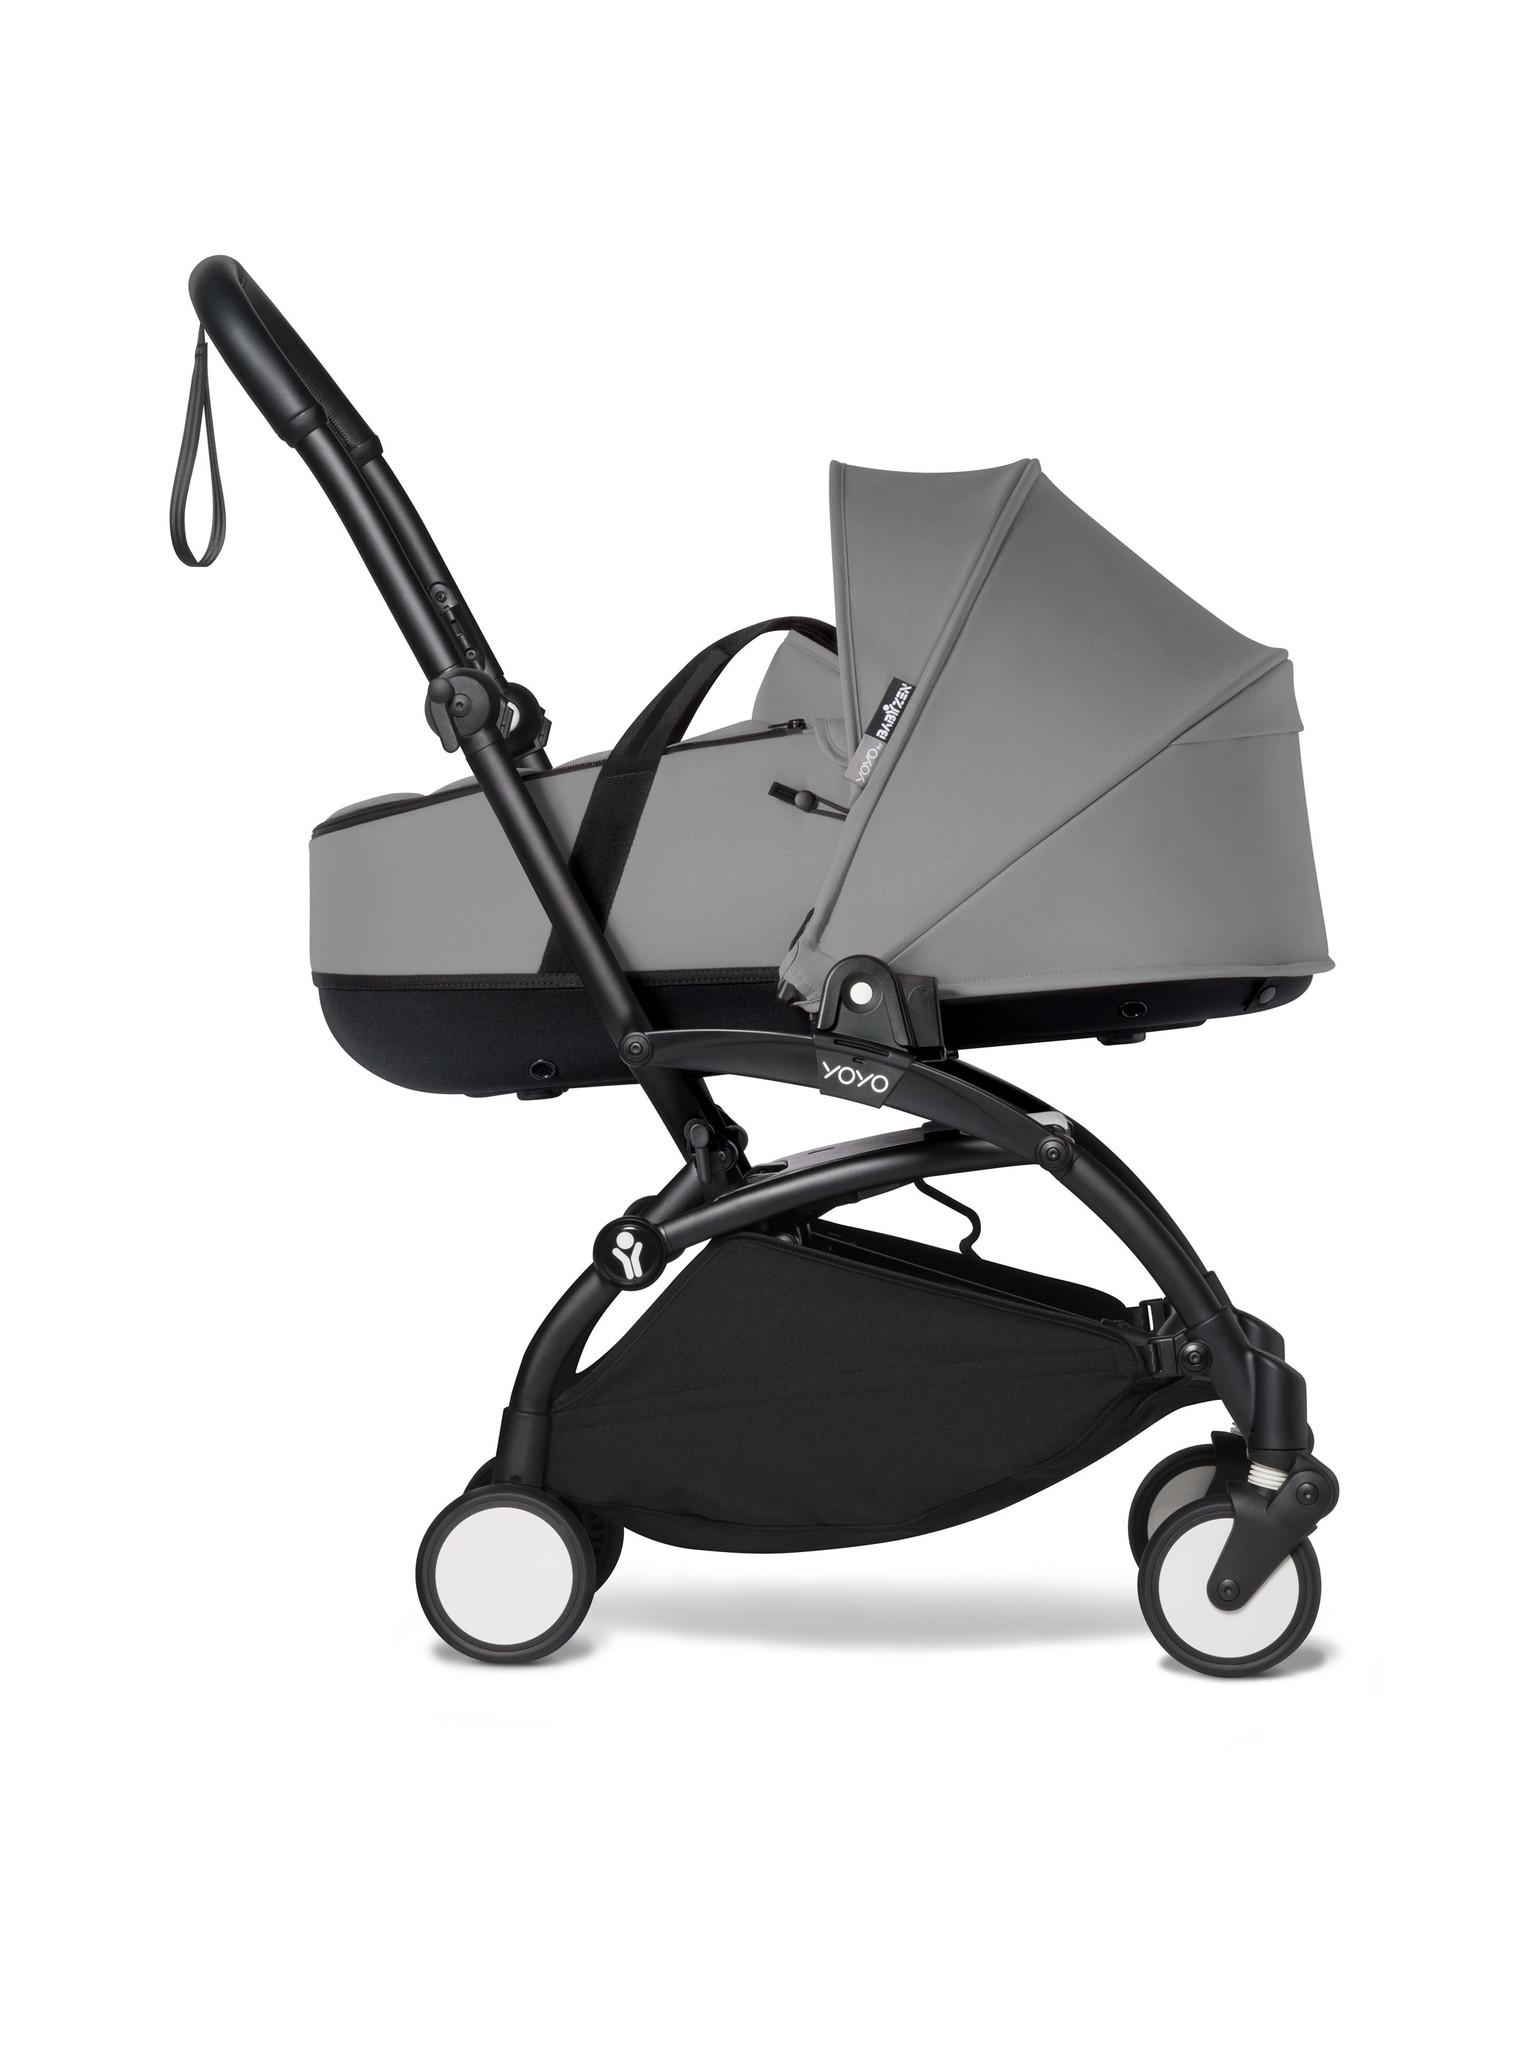 Babyzen Babyzen YOYO² schwarzer Rahmen mit YOYO Stubenwagen - Tragetasche - Grau